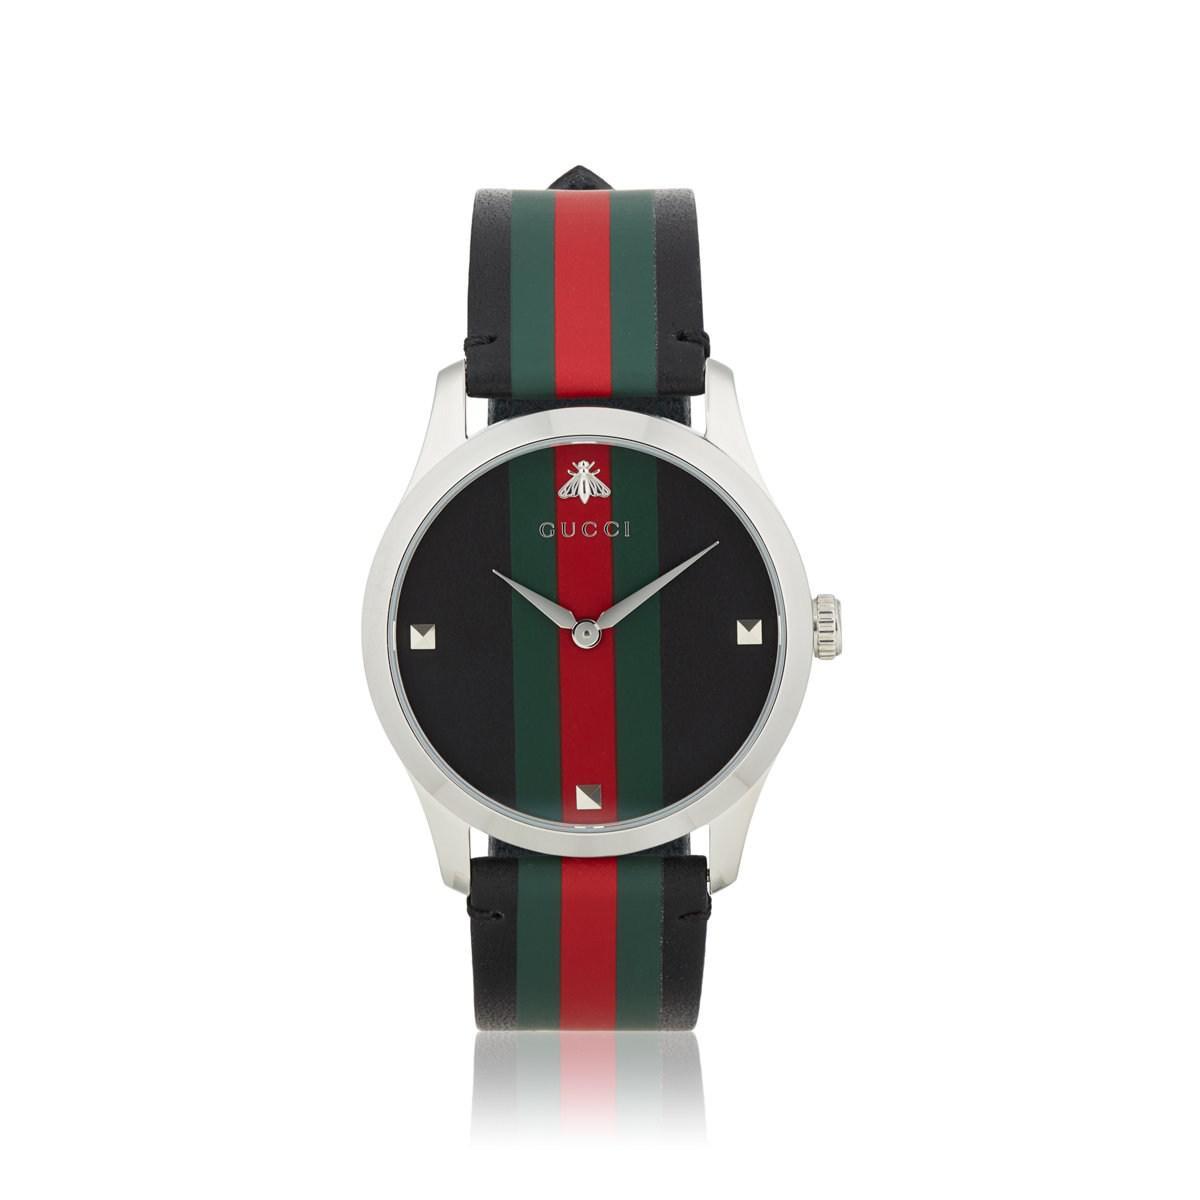 bcdb2518b73 Gucci - Black G-timeless Watch for Men - Lyst. View fullscreen